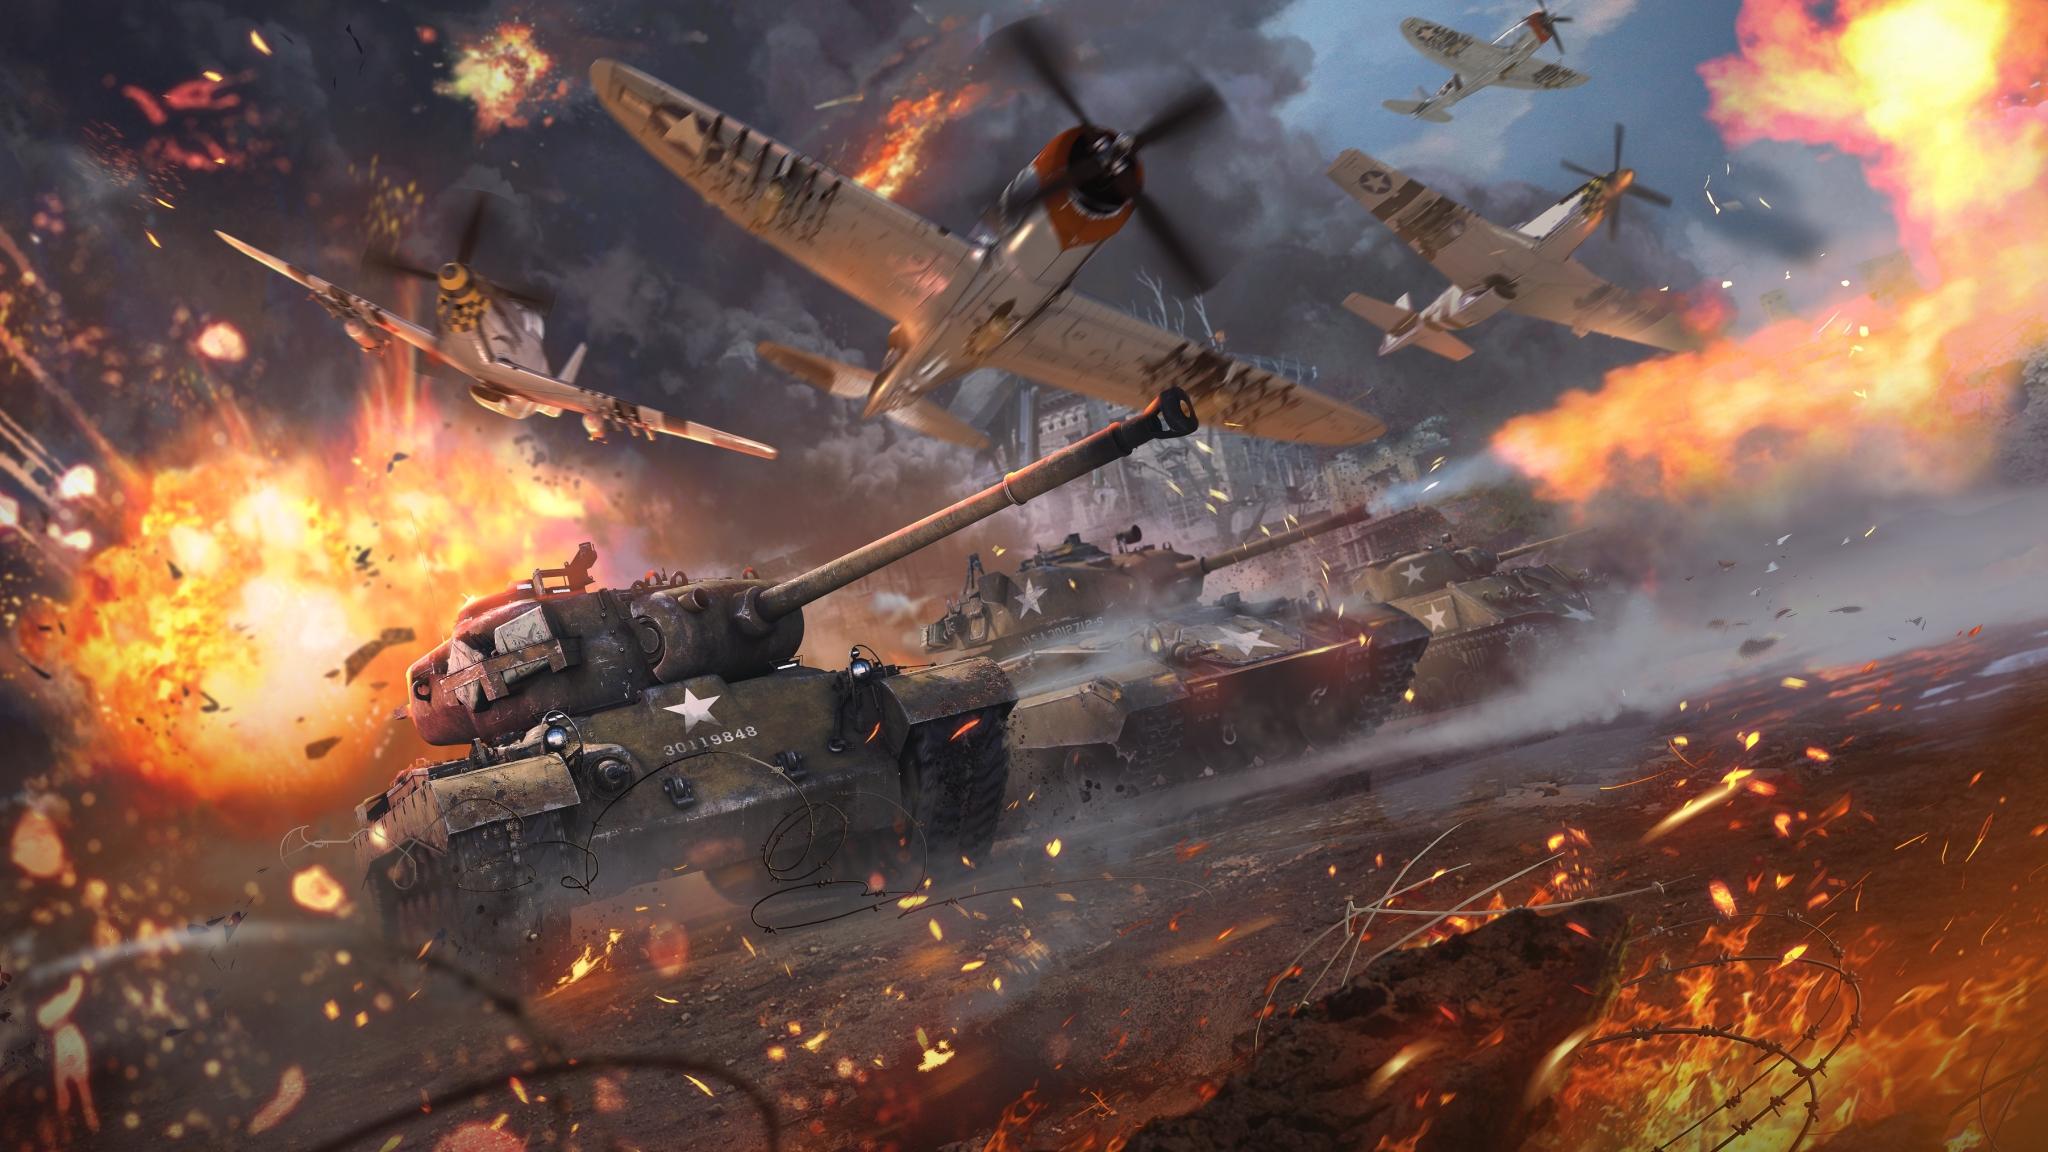 War Thunder Video Game, HD 4K Wallpaper